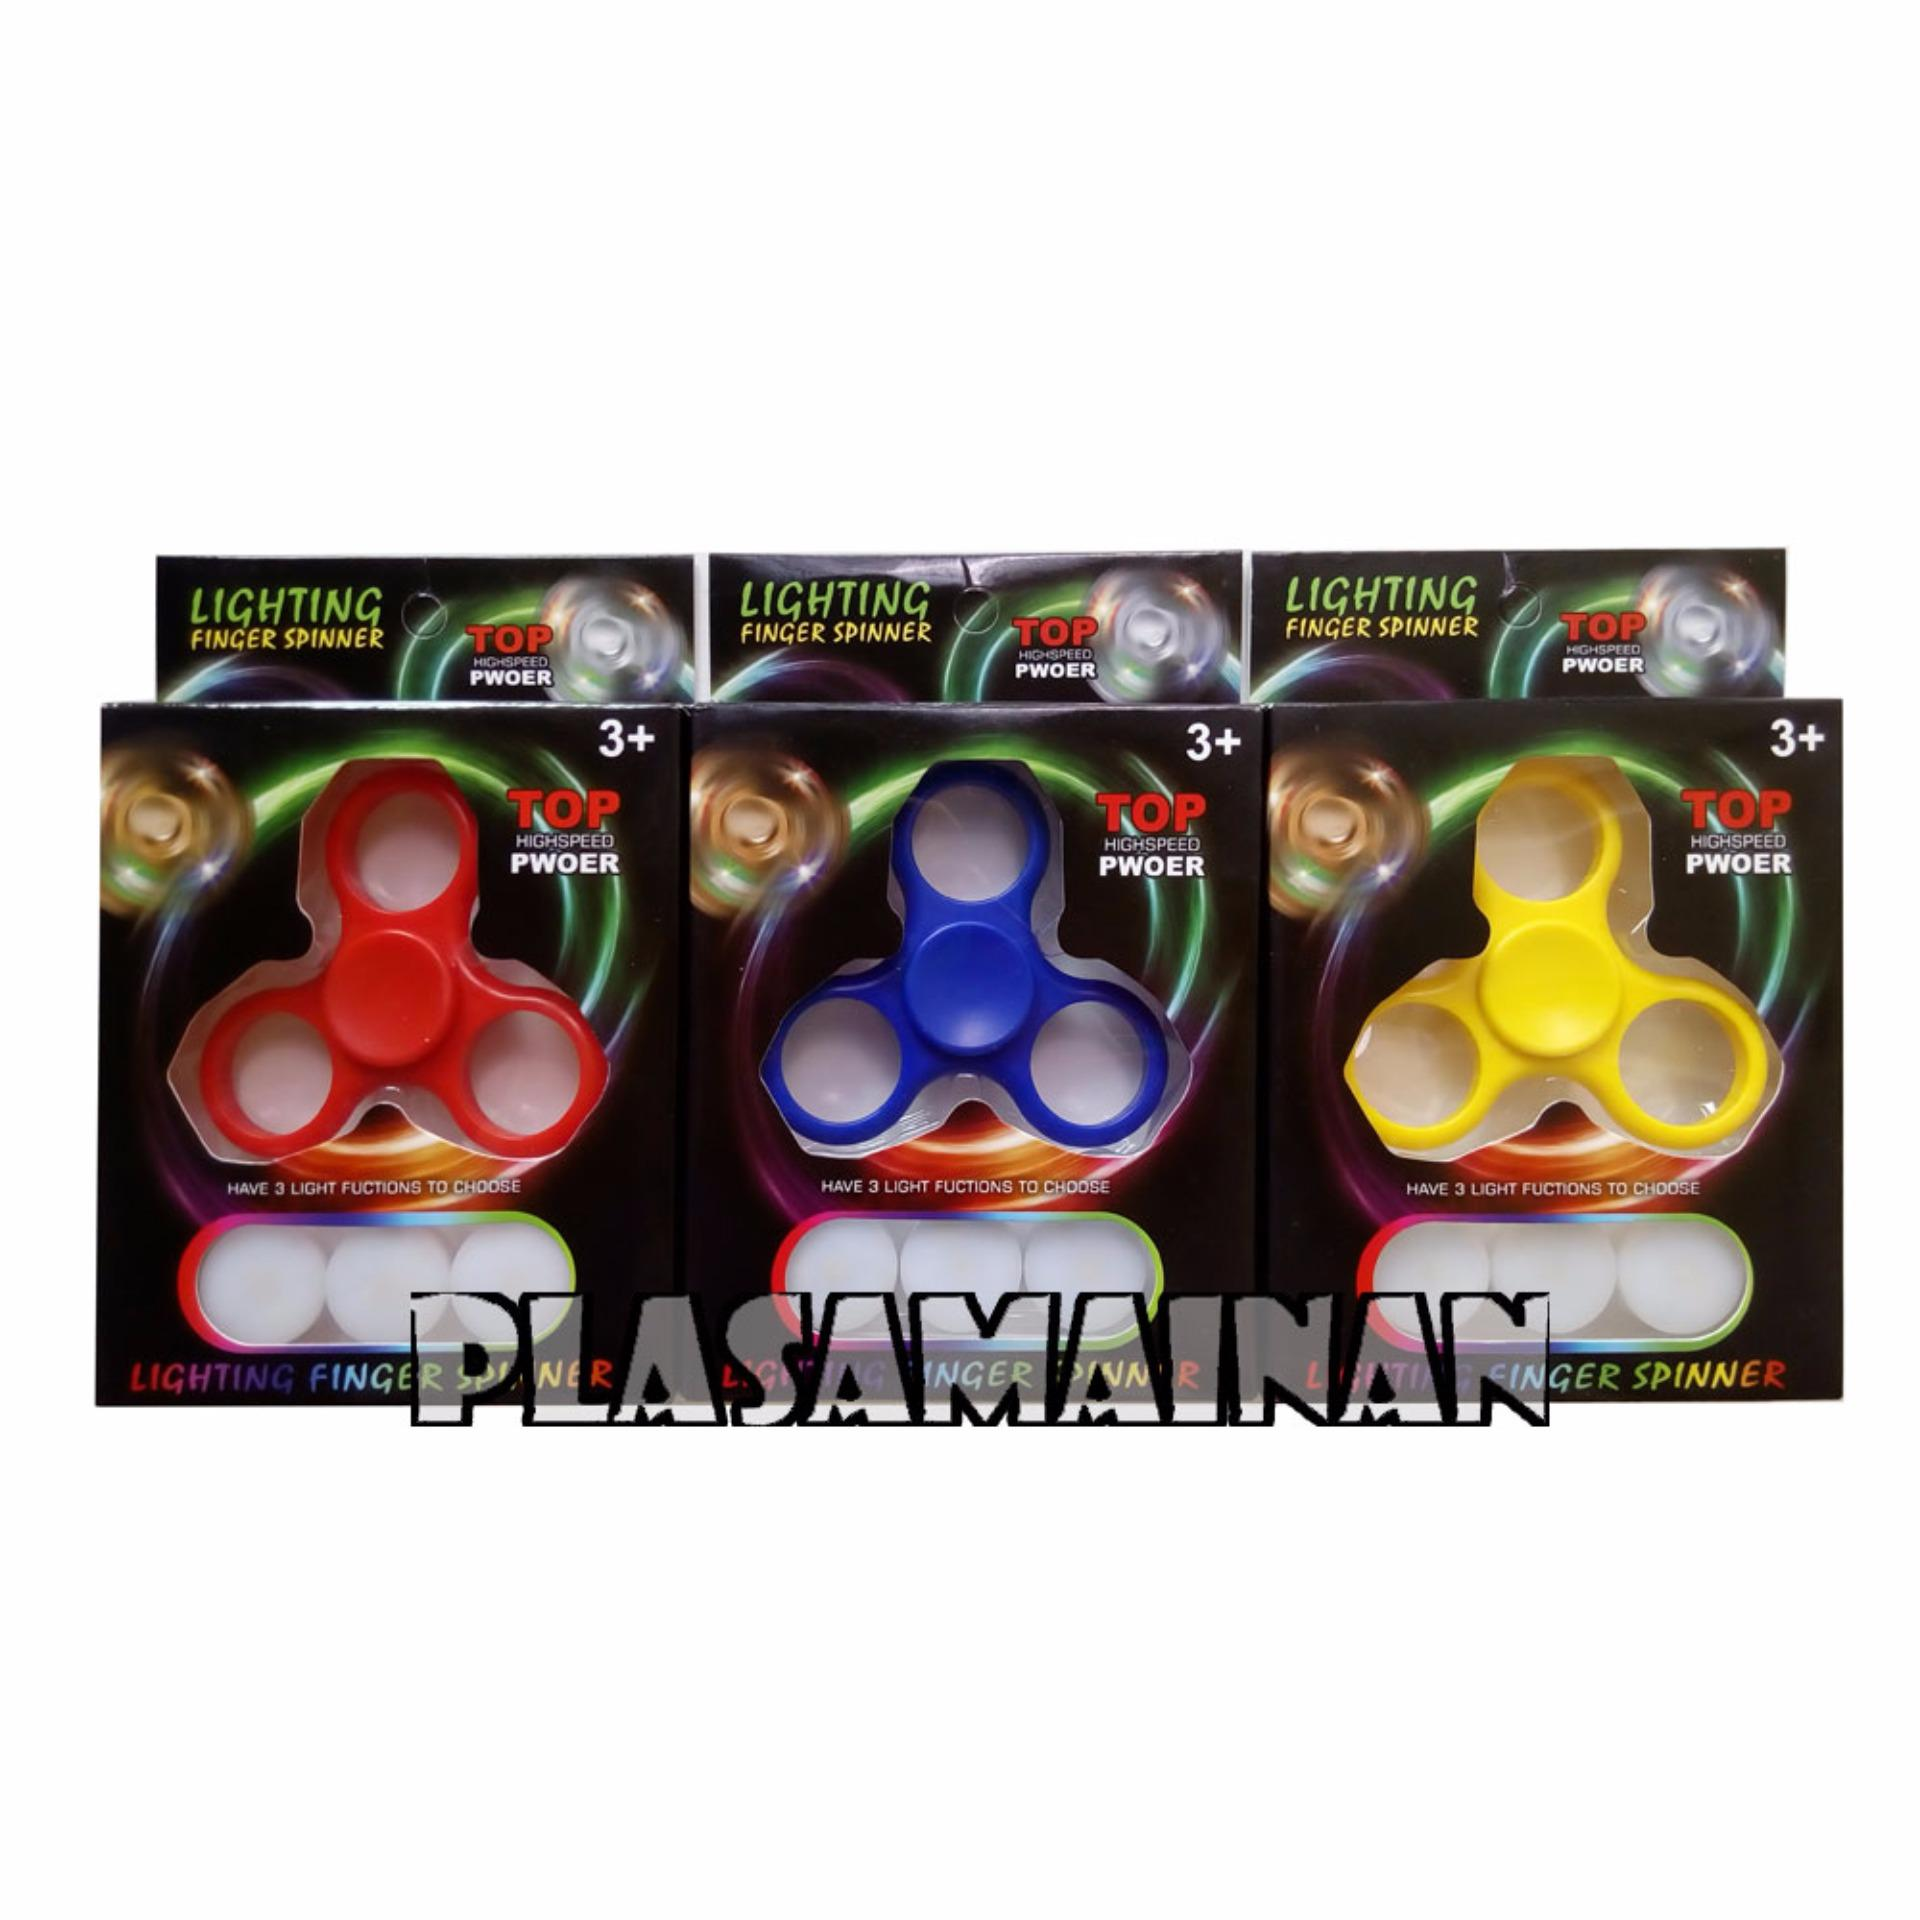 Aa Toys Led Lighting Finger Spinner Biru Hand Daftar Wanky Fidget Mainan Edukasi Anak Kuning